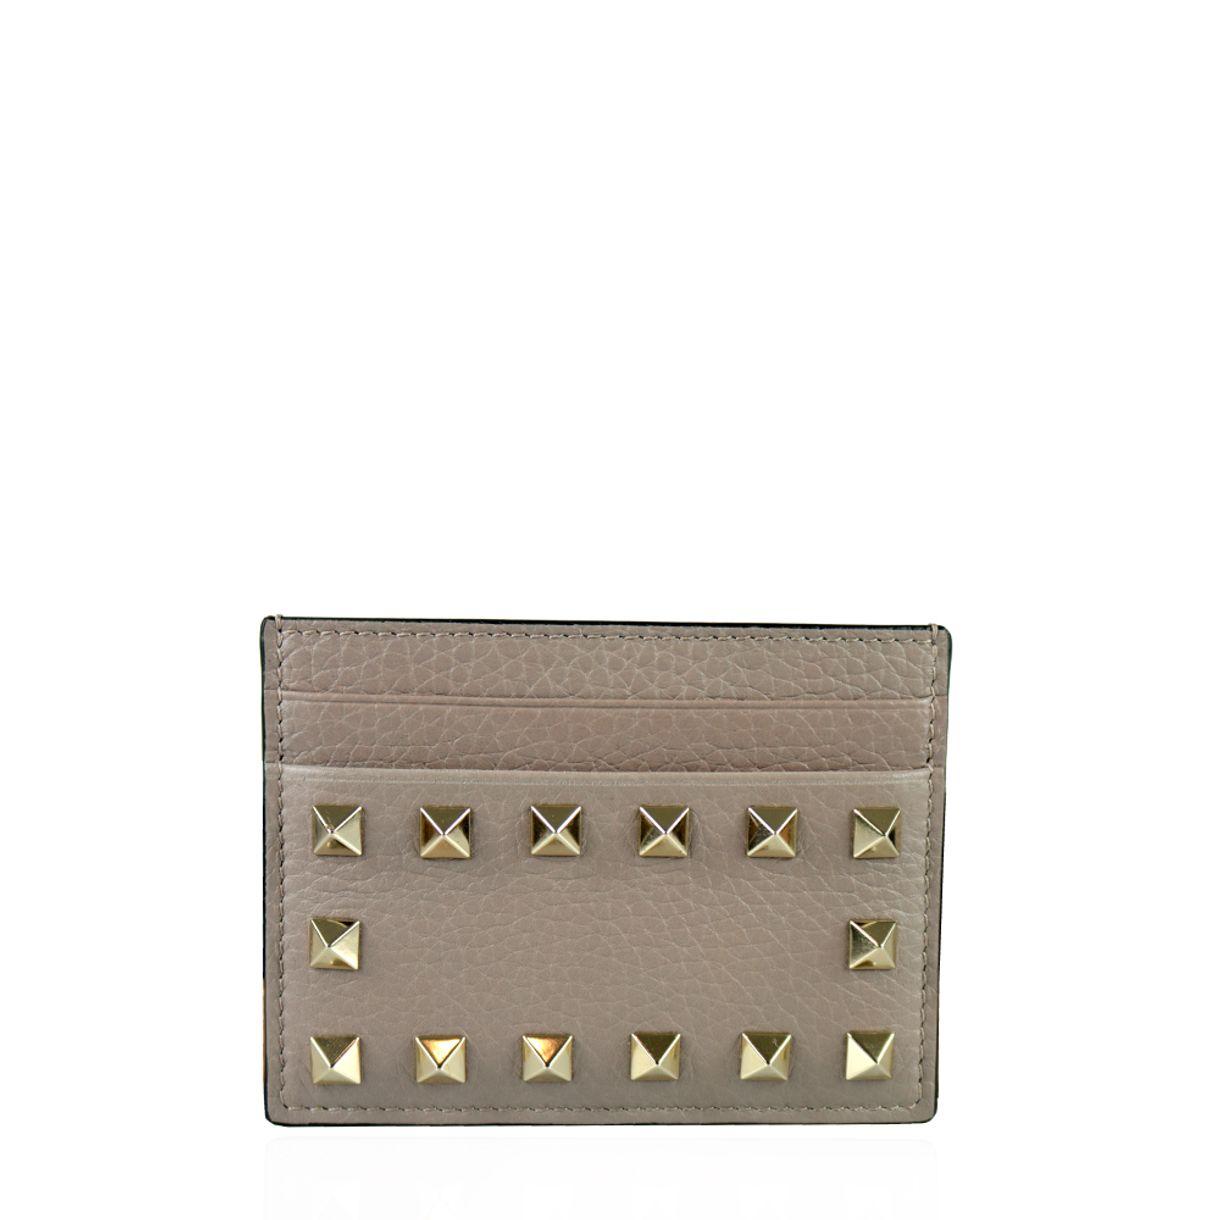 60958-Porta-Cartao-Valentino-Couro-Bronze-Rockstud